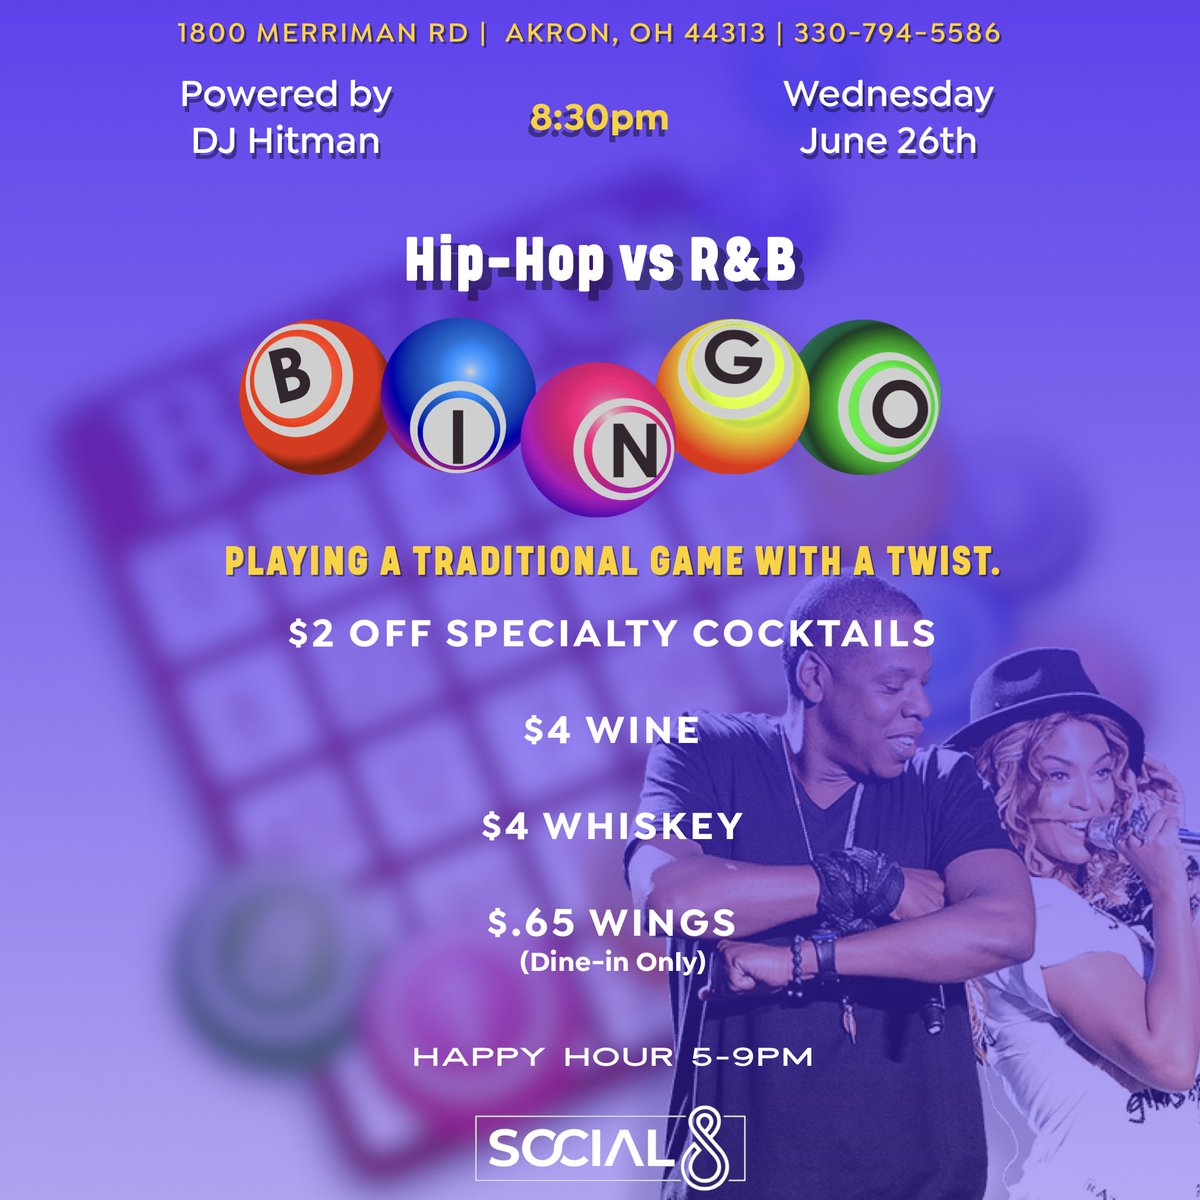 New events coming to Social 8!!! _____ #Social8 #Social8Akron #Akron   #SocialLife #thisisakron #AkronProud #socialize #network  #positivevibes #socialhour #happyhour #social8socialhour  #drinkspecials #thevalley #merrimanvalley #merrimanvalleyohio #valleydistrict #gamenight